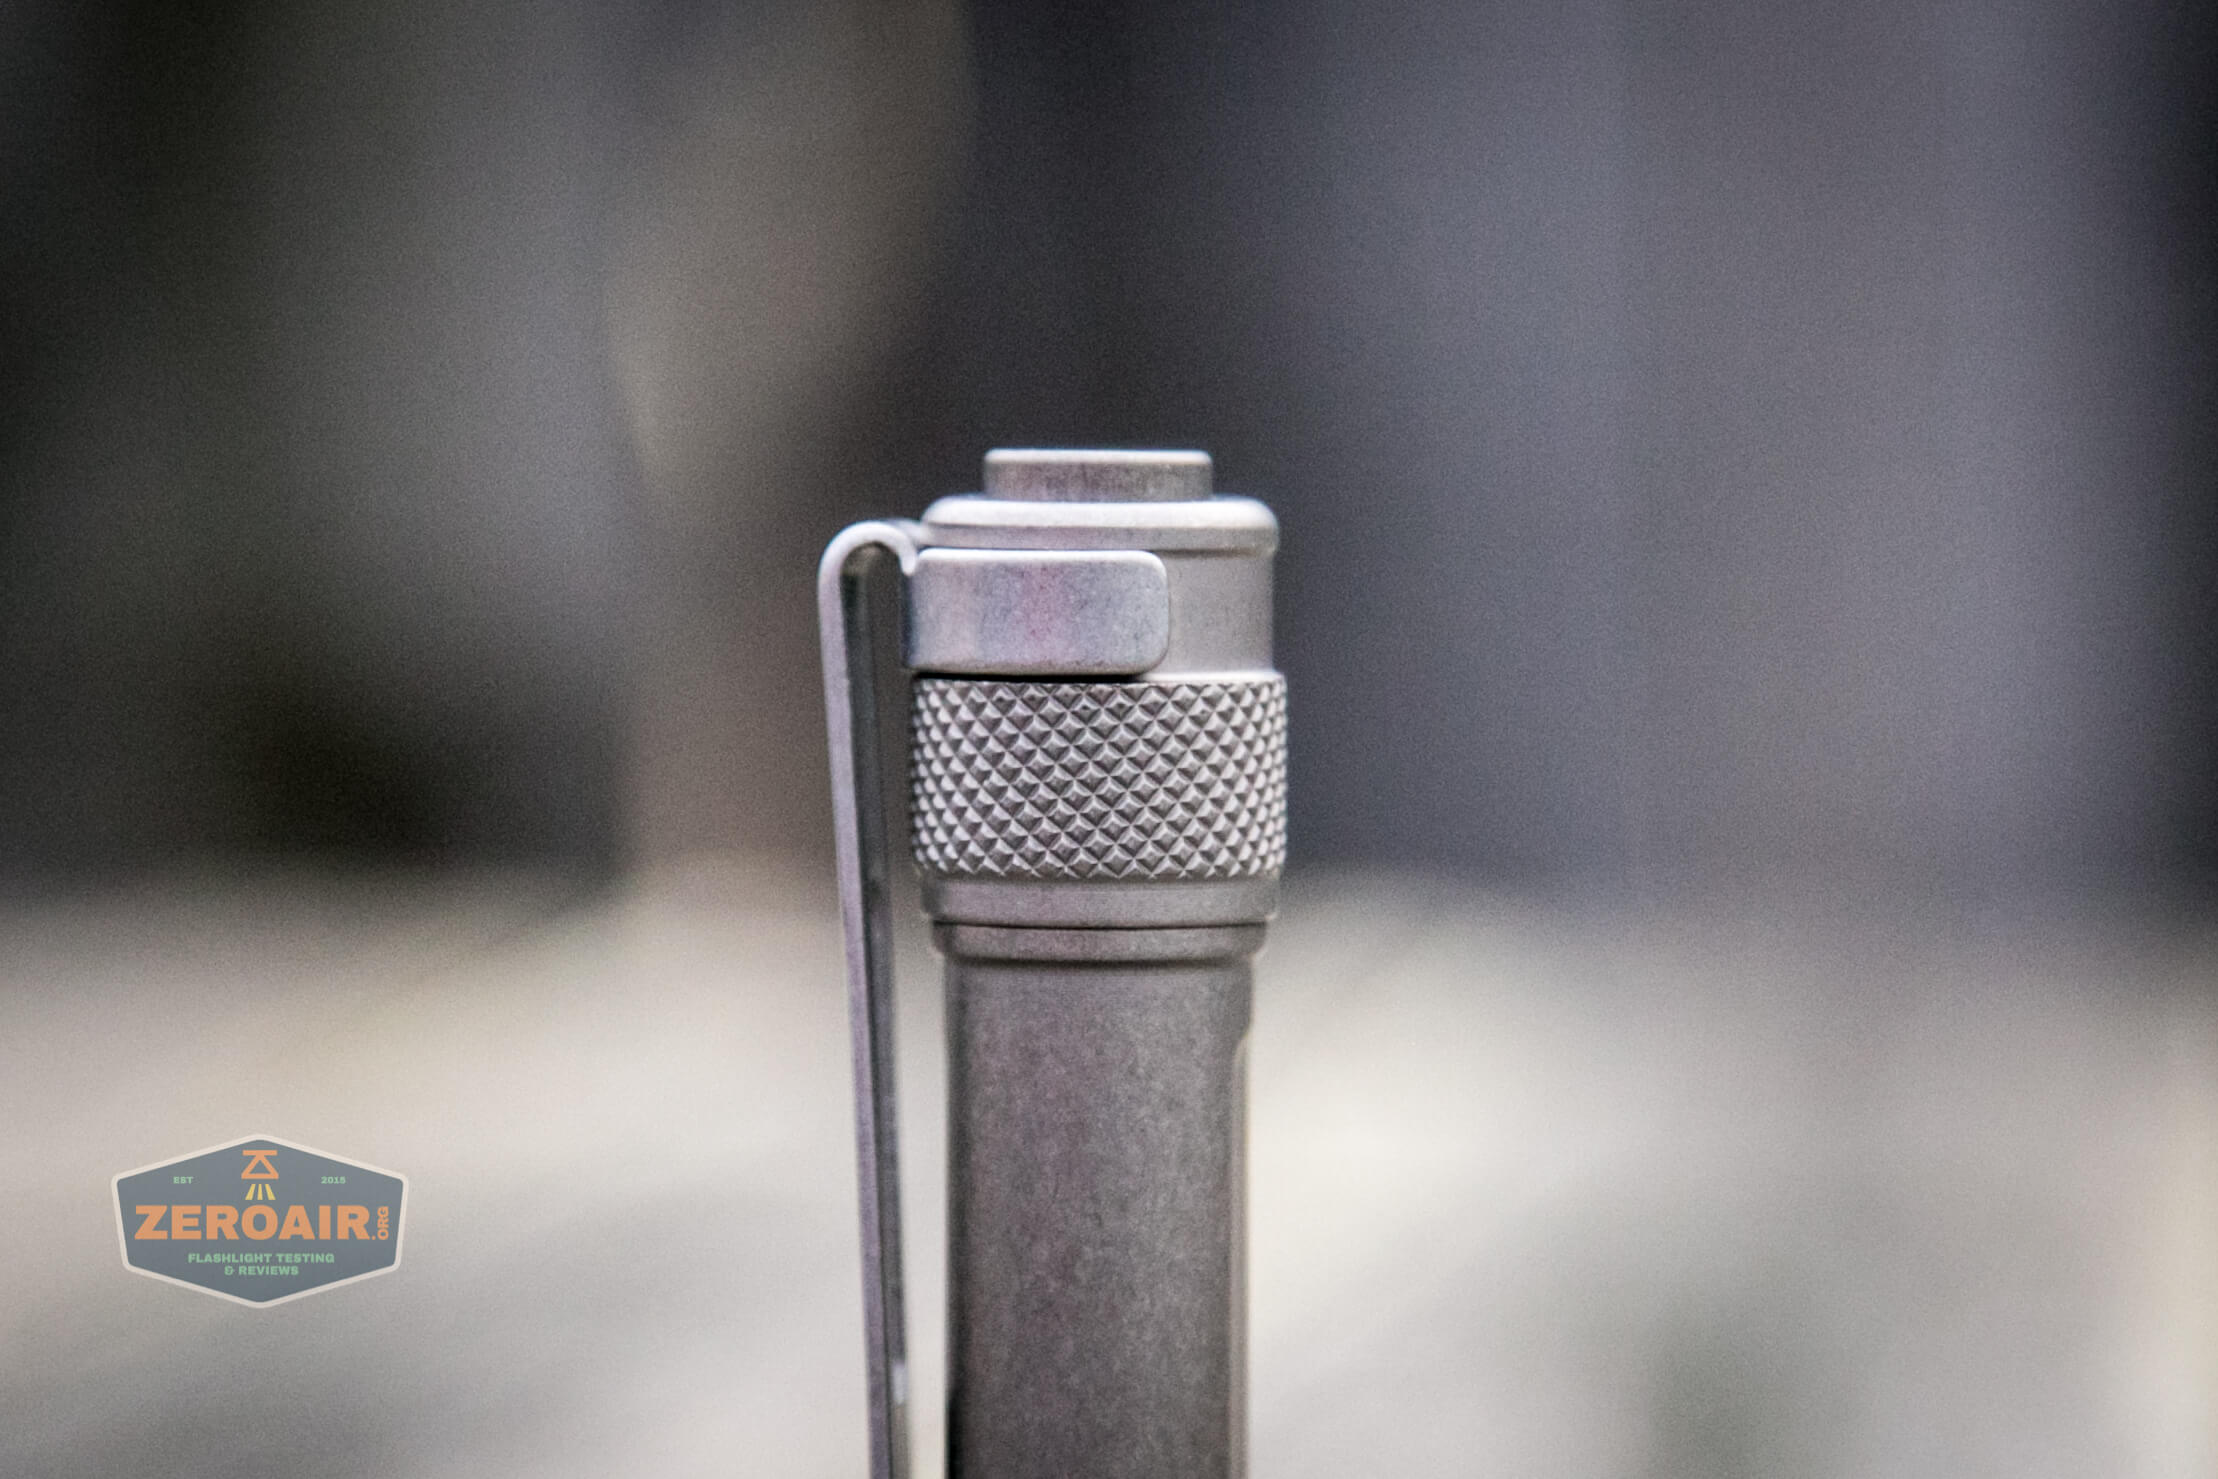 Seeknite SK03 friction fit pocket clip and knurling